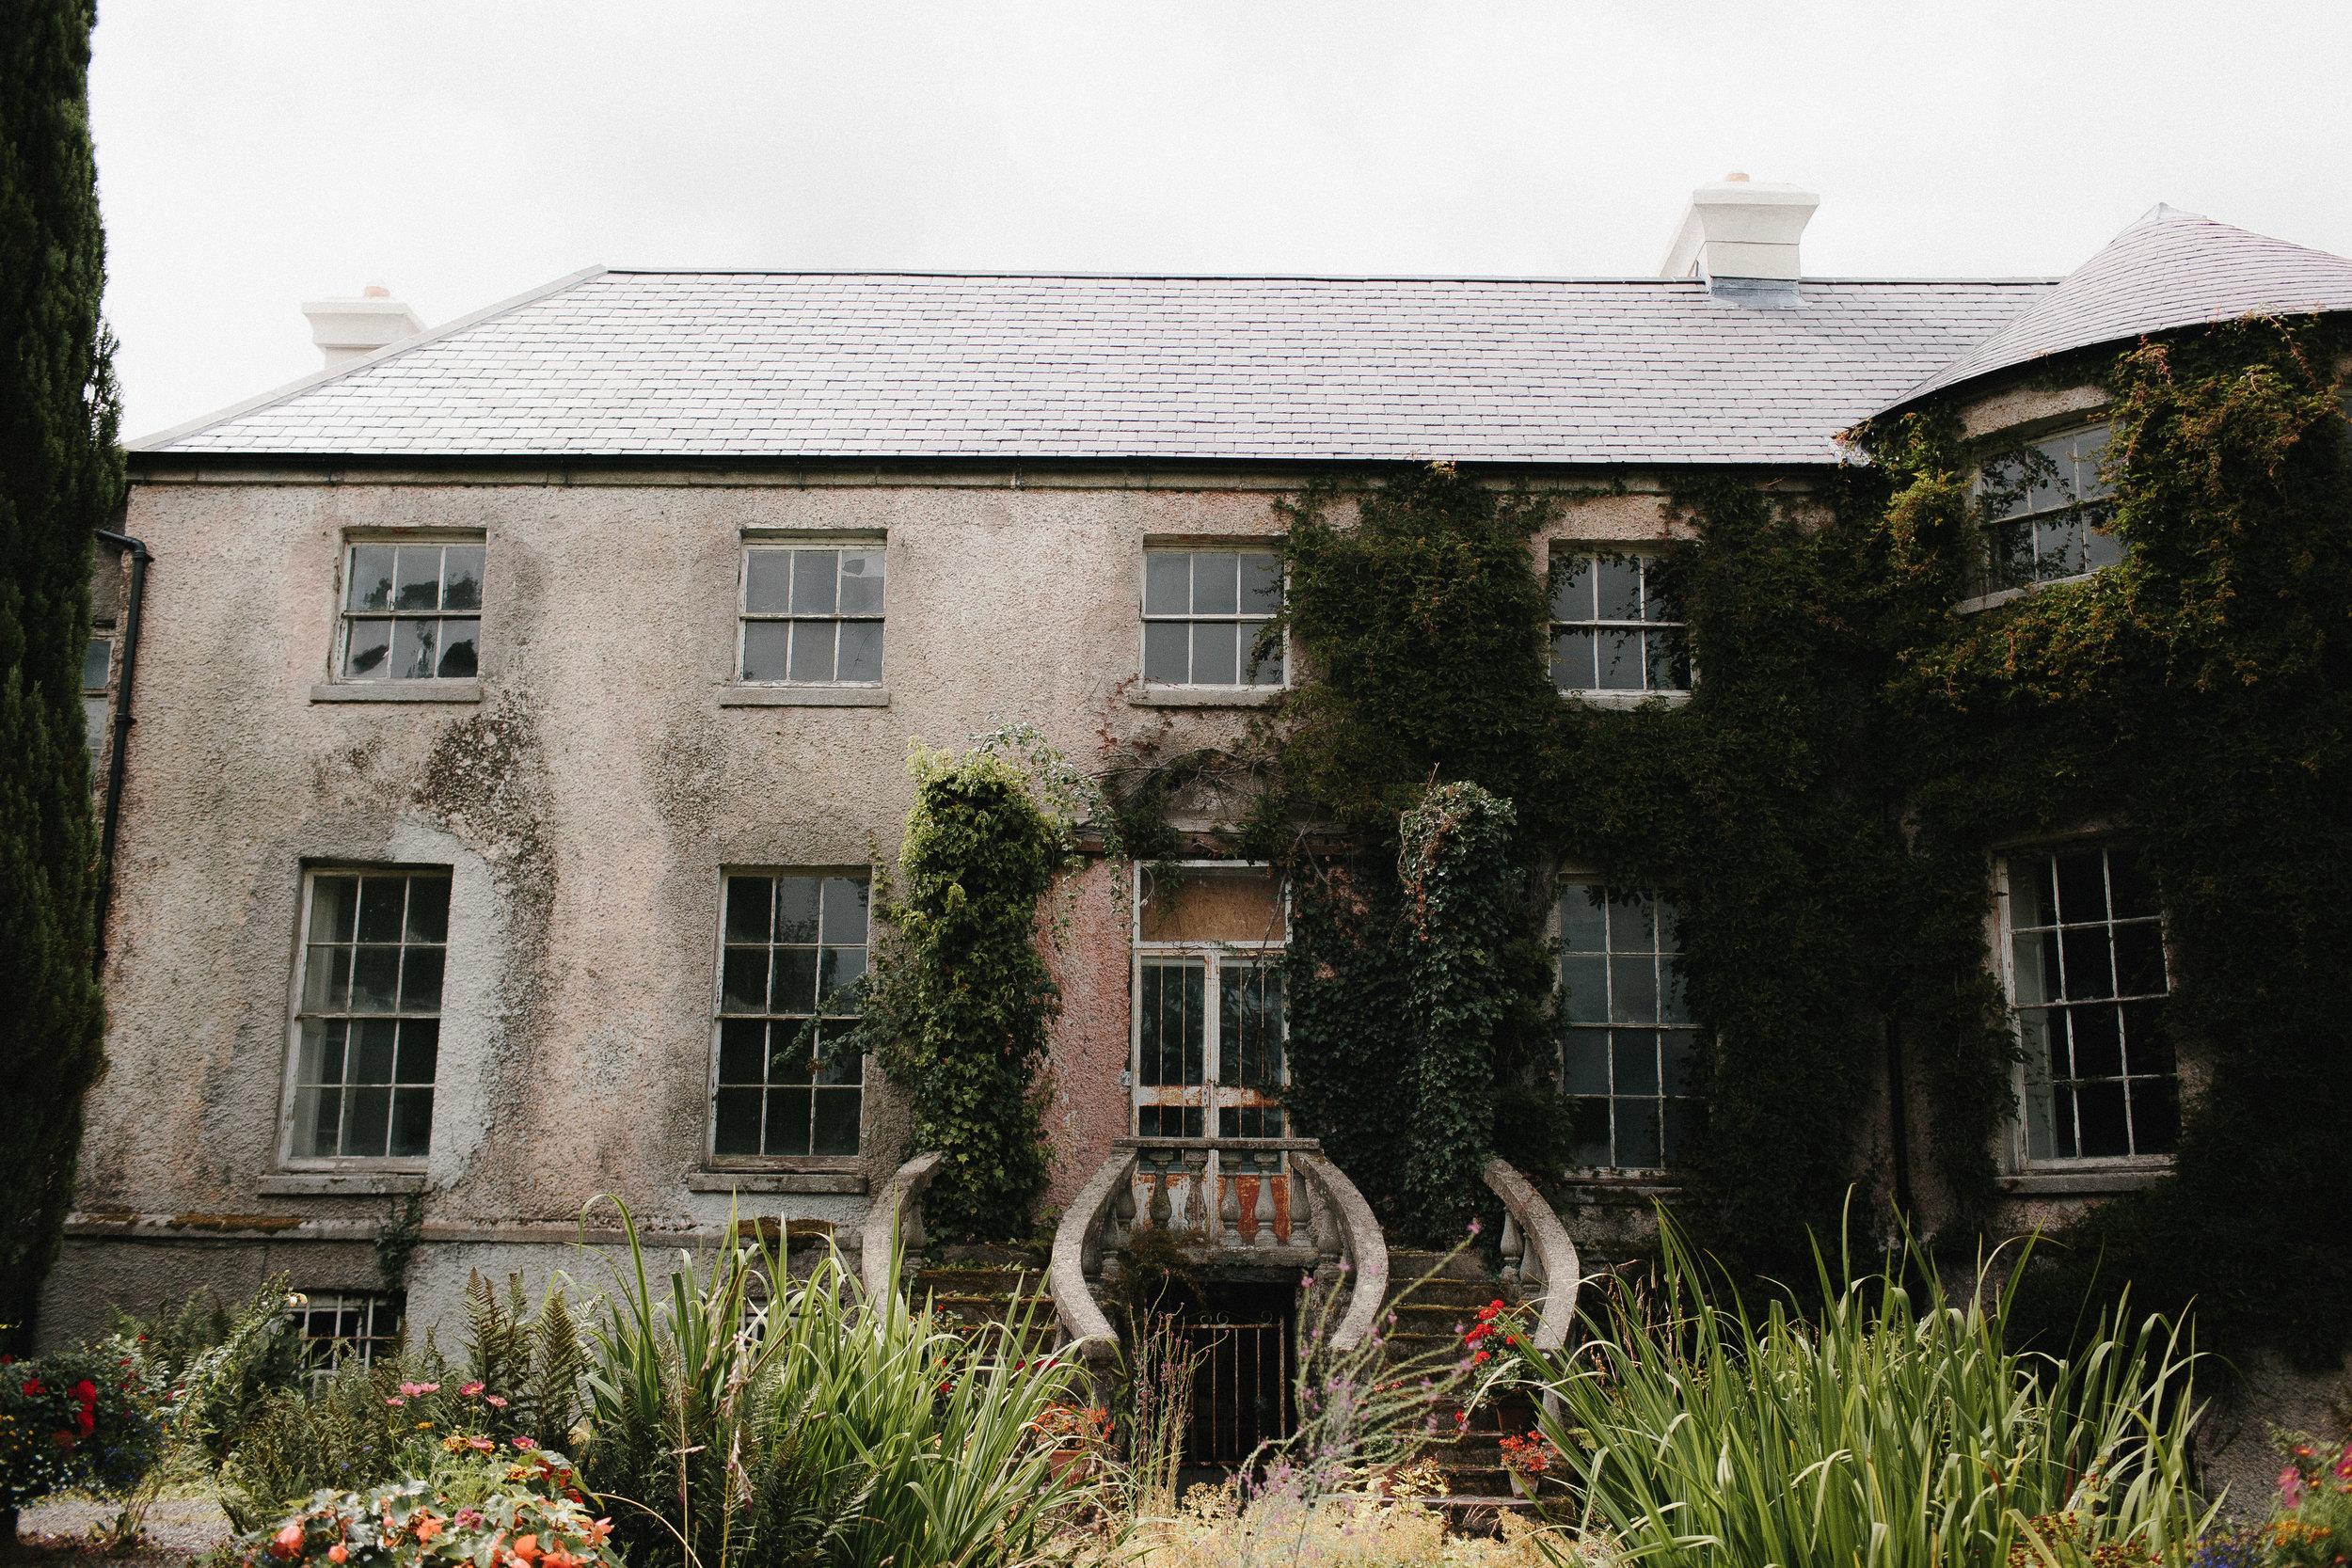 ireland_county_wicklow_glendalough_engagement_adventure_photography_windy_moody_atlanta_wedding_photographer_1128.jpg